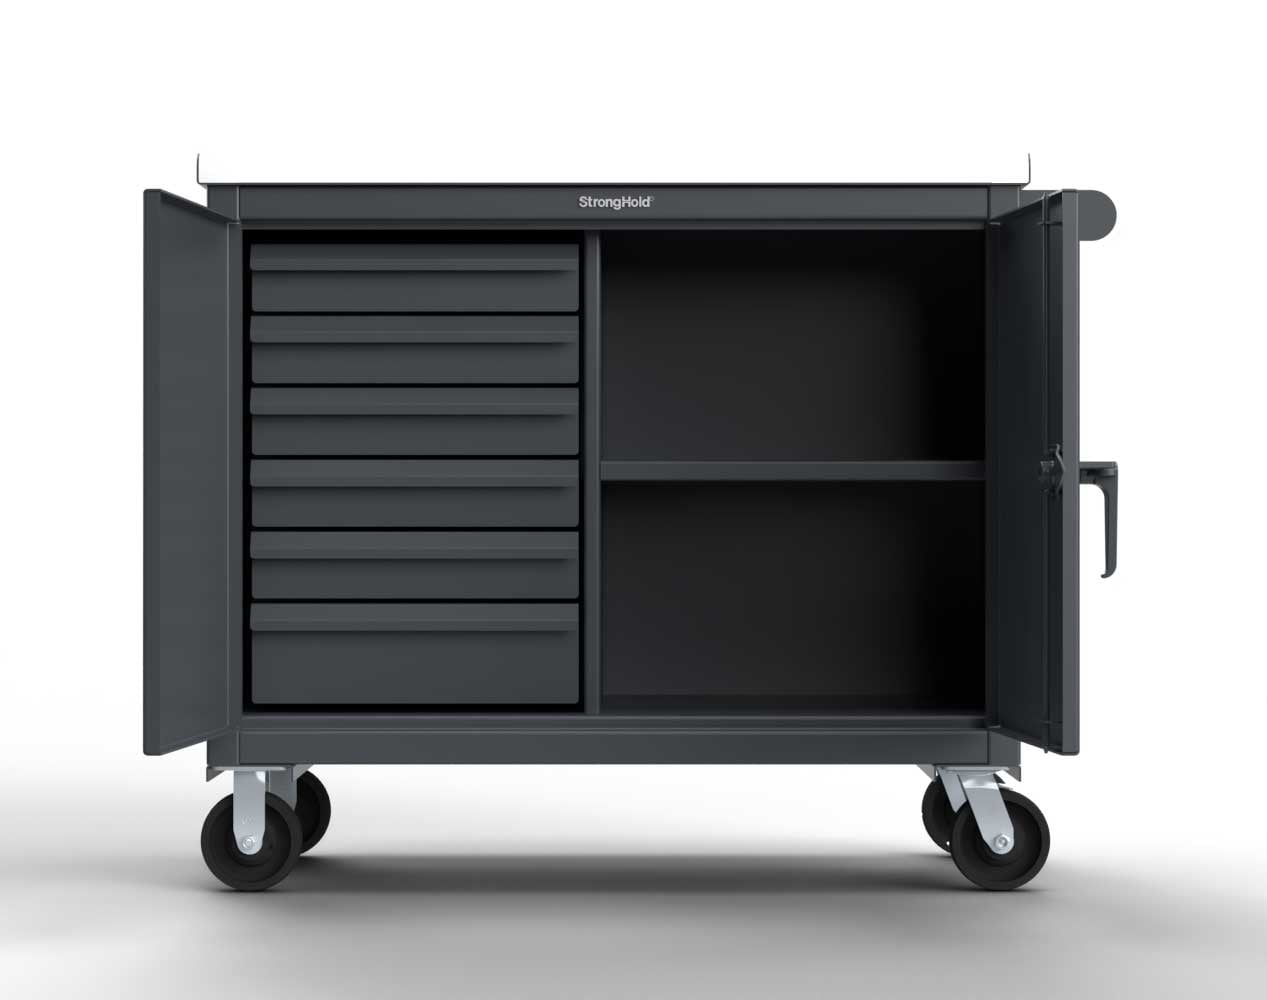 Extra Heavy Duty 12 GA Mobile Tool Cart with 7 GA Steel Top, 6 Half-Width Drawers, 1 Shelf – 48 in. W x 24 in. D x 44 in. H